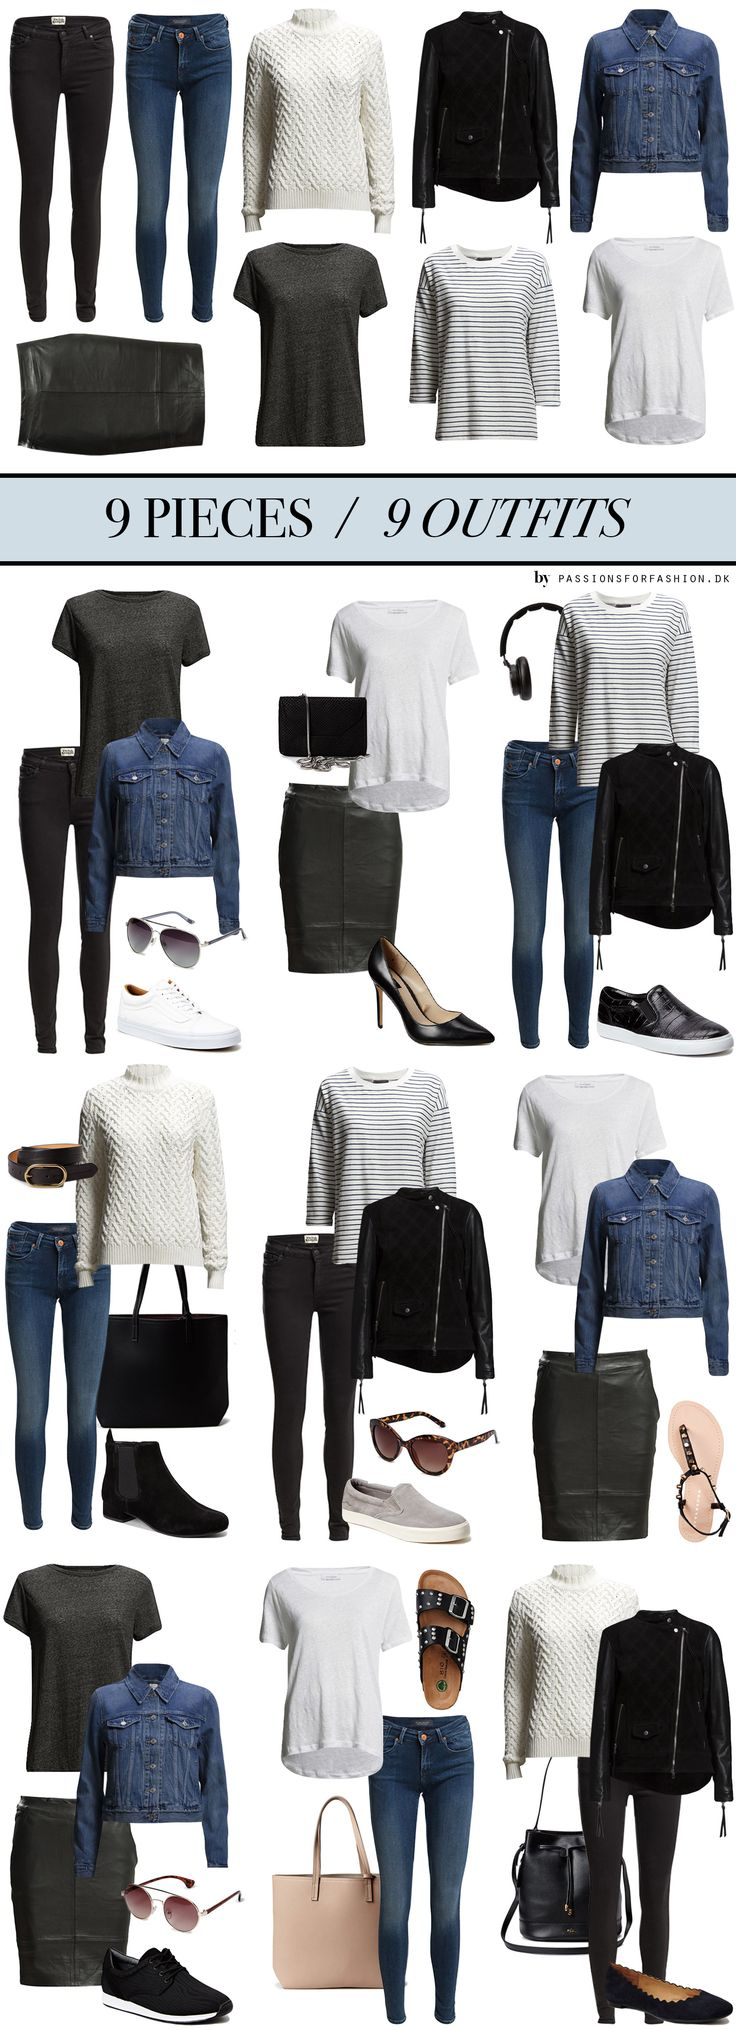 9-pieces-9-outfits mix & match minimal wardrobe AW